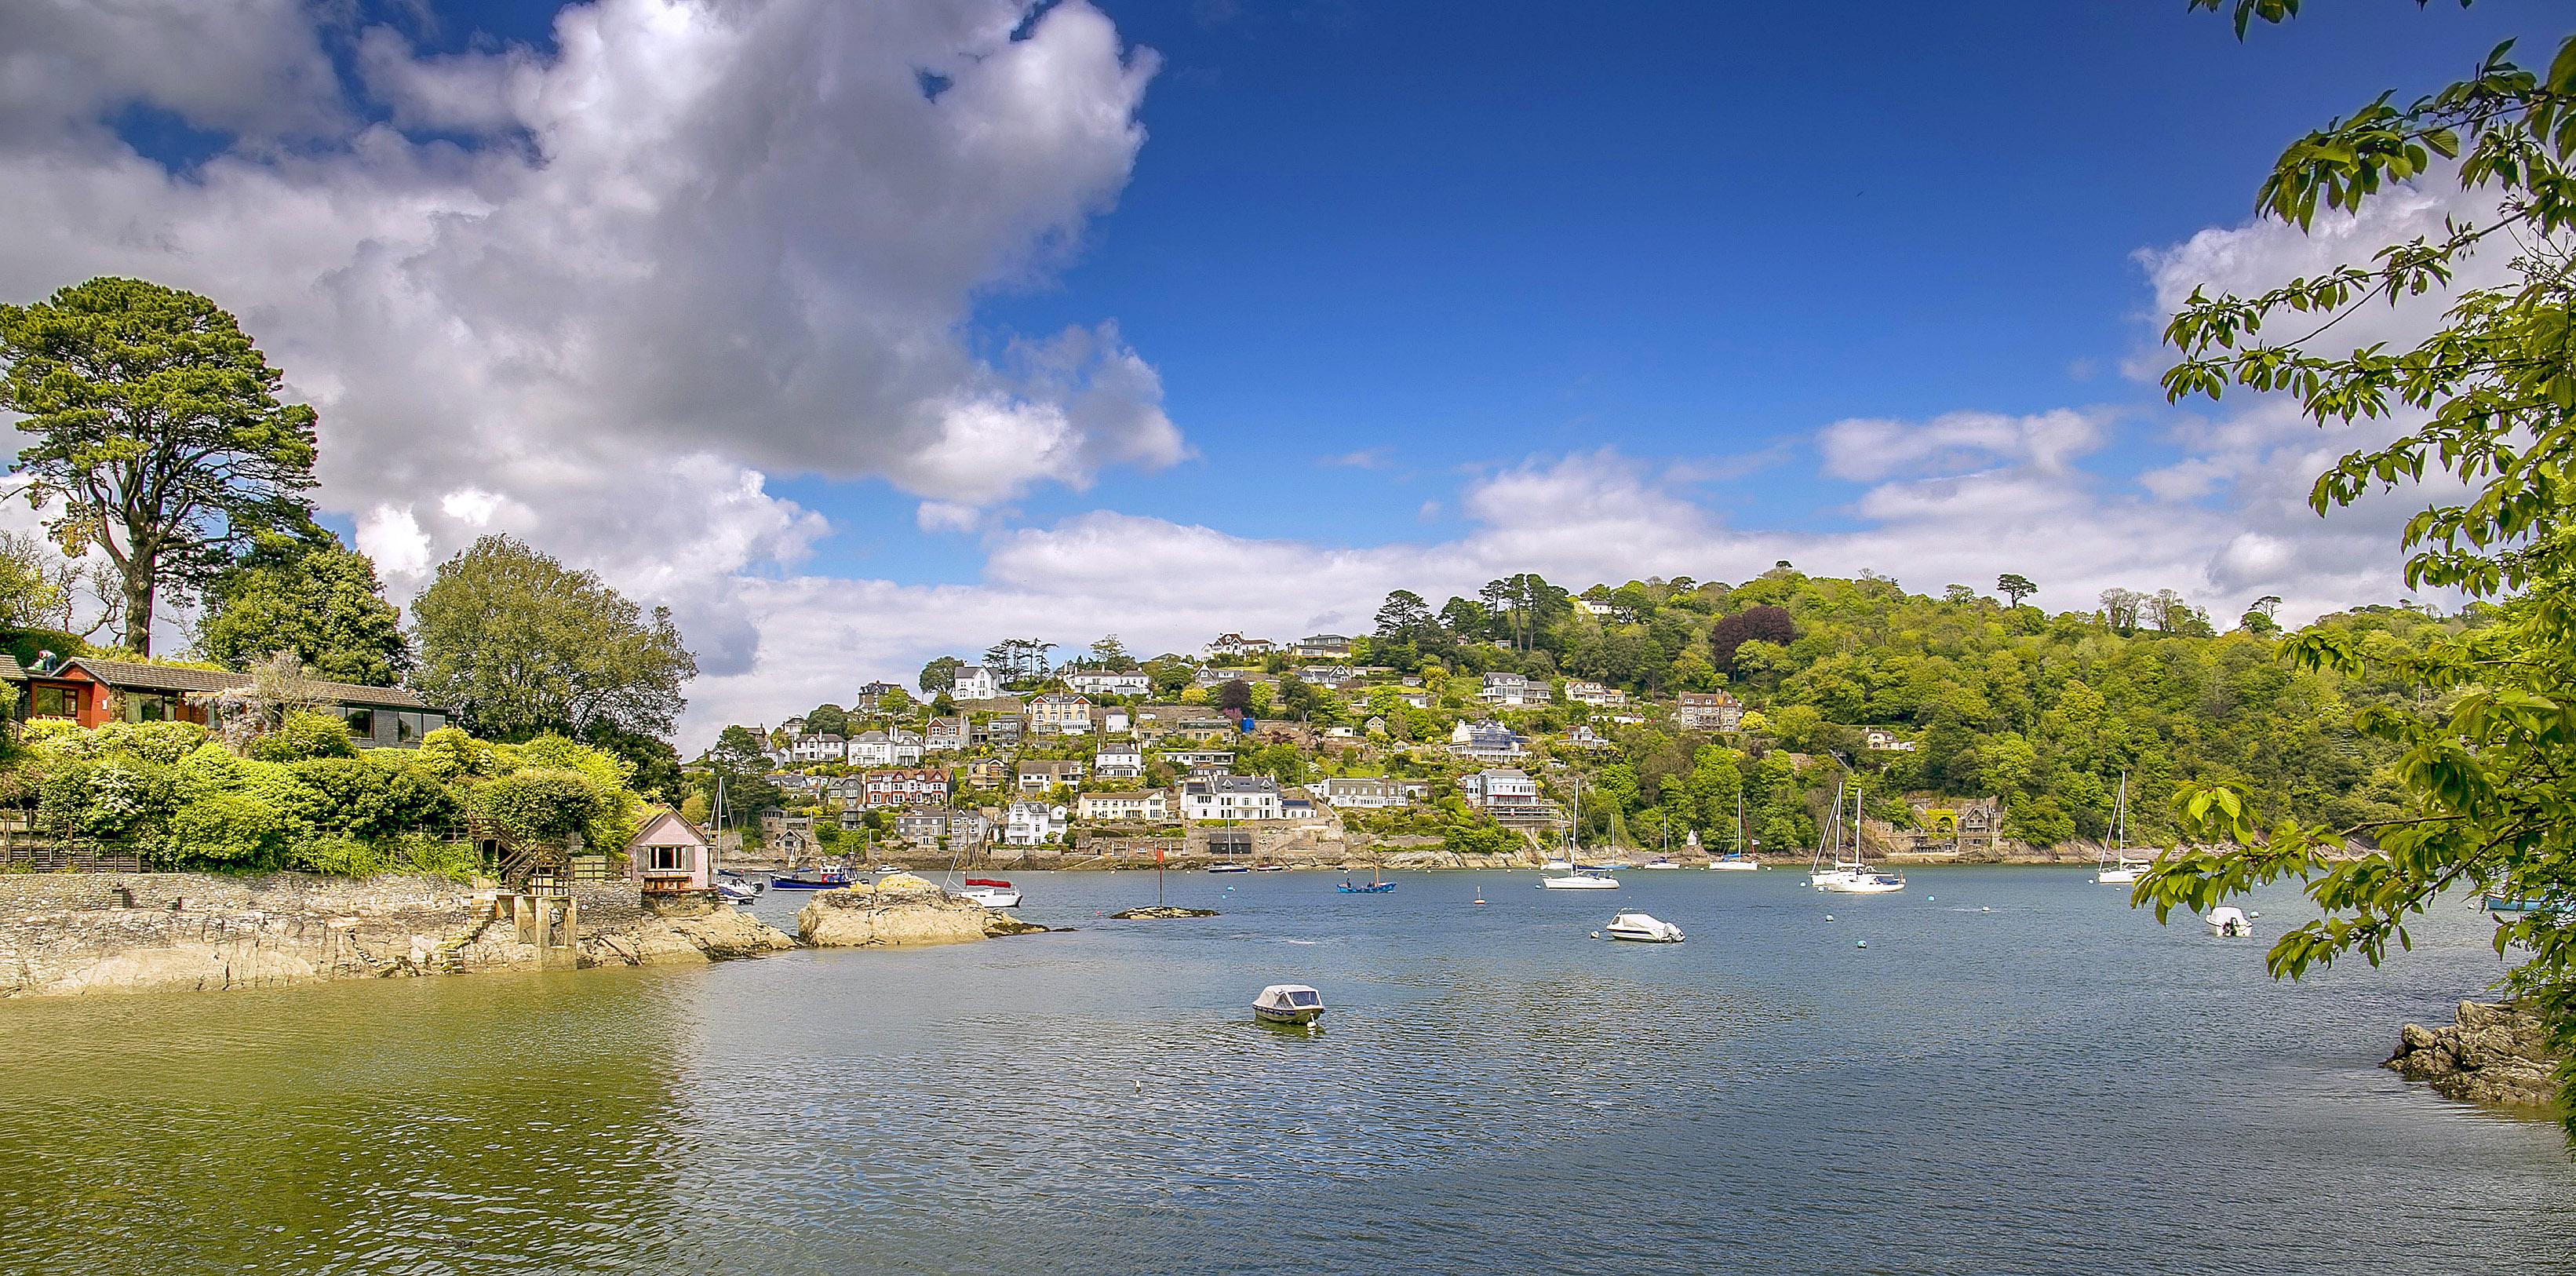 Warfleet Cove, Dartmouth by Steve Mantell.jpg